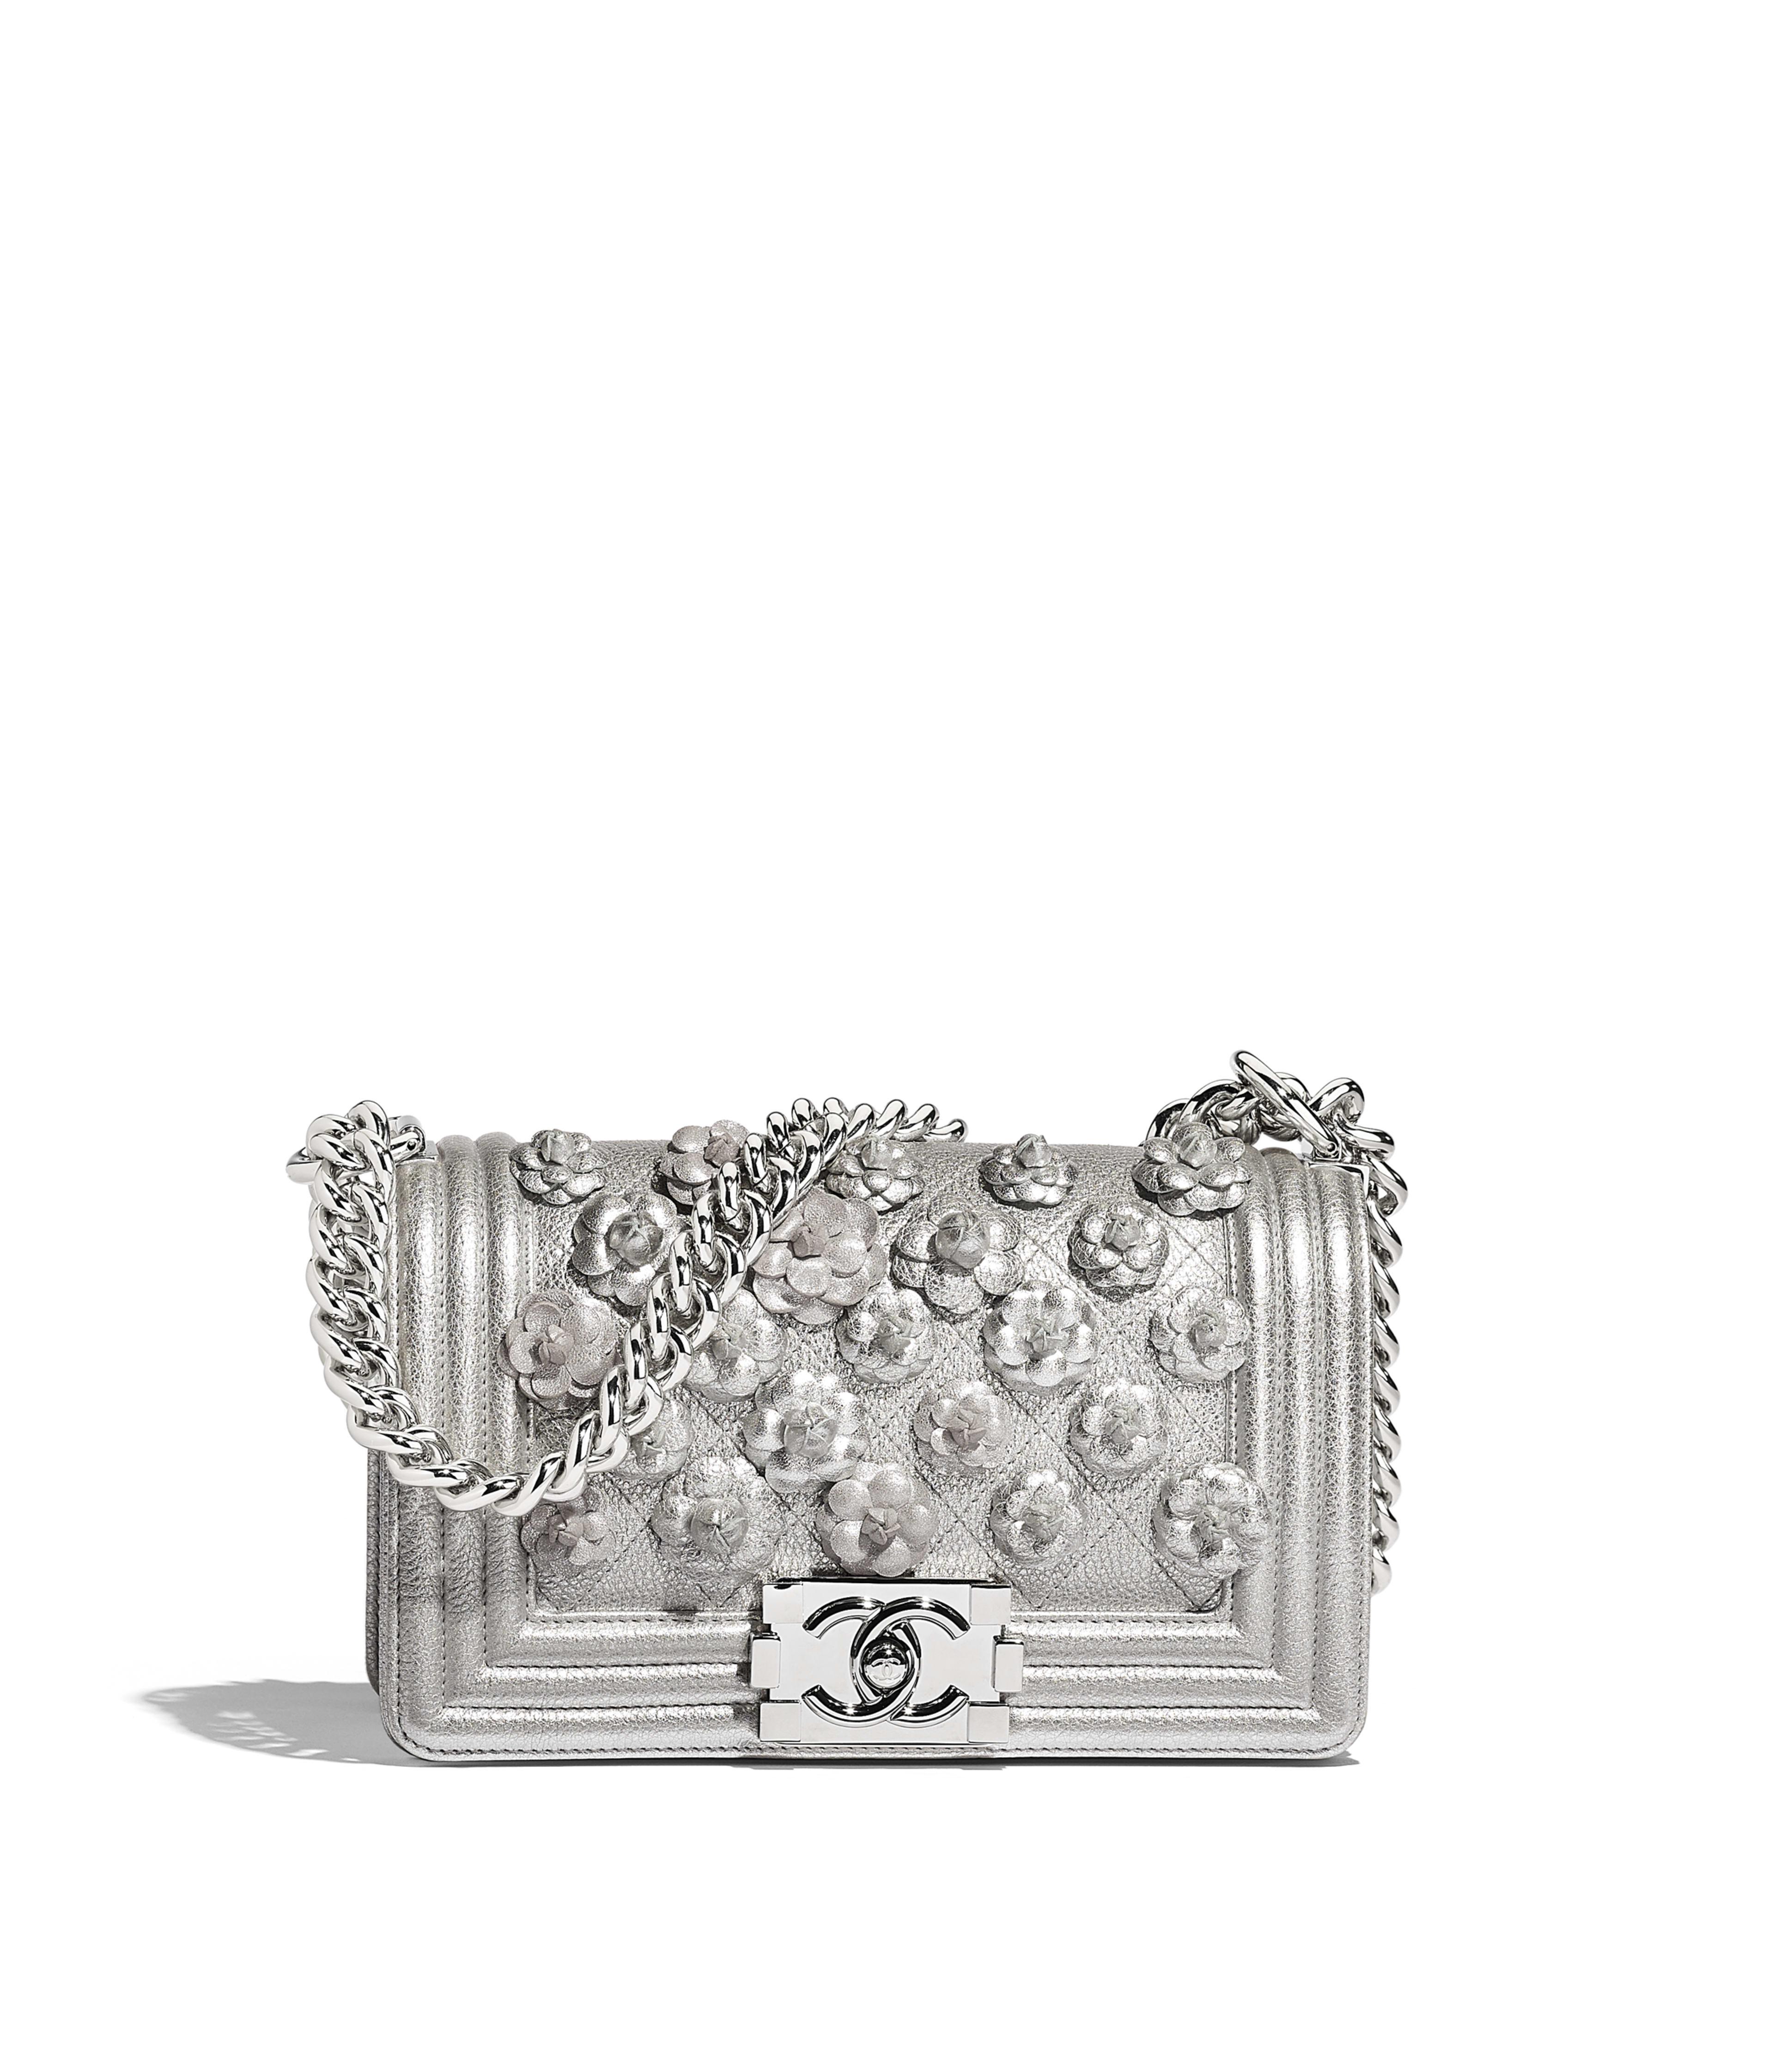 ff9507033e4 Small BOY CHANEL Handbag Embroidered Metallic Grained Calfskin & Silver-Tone  Metal, Silver Ref. A67085B0012545002